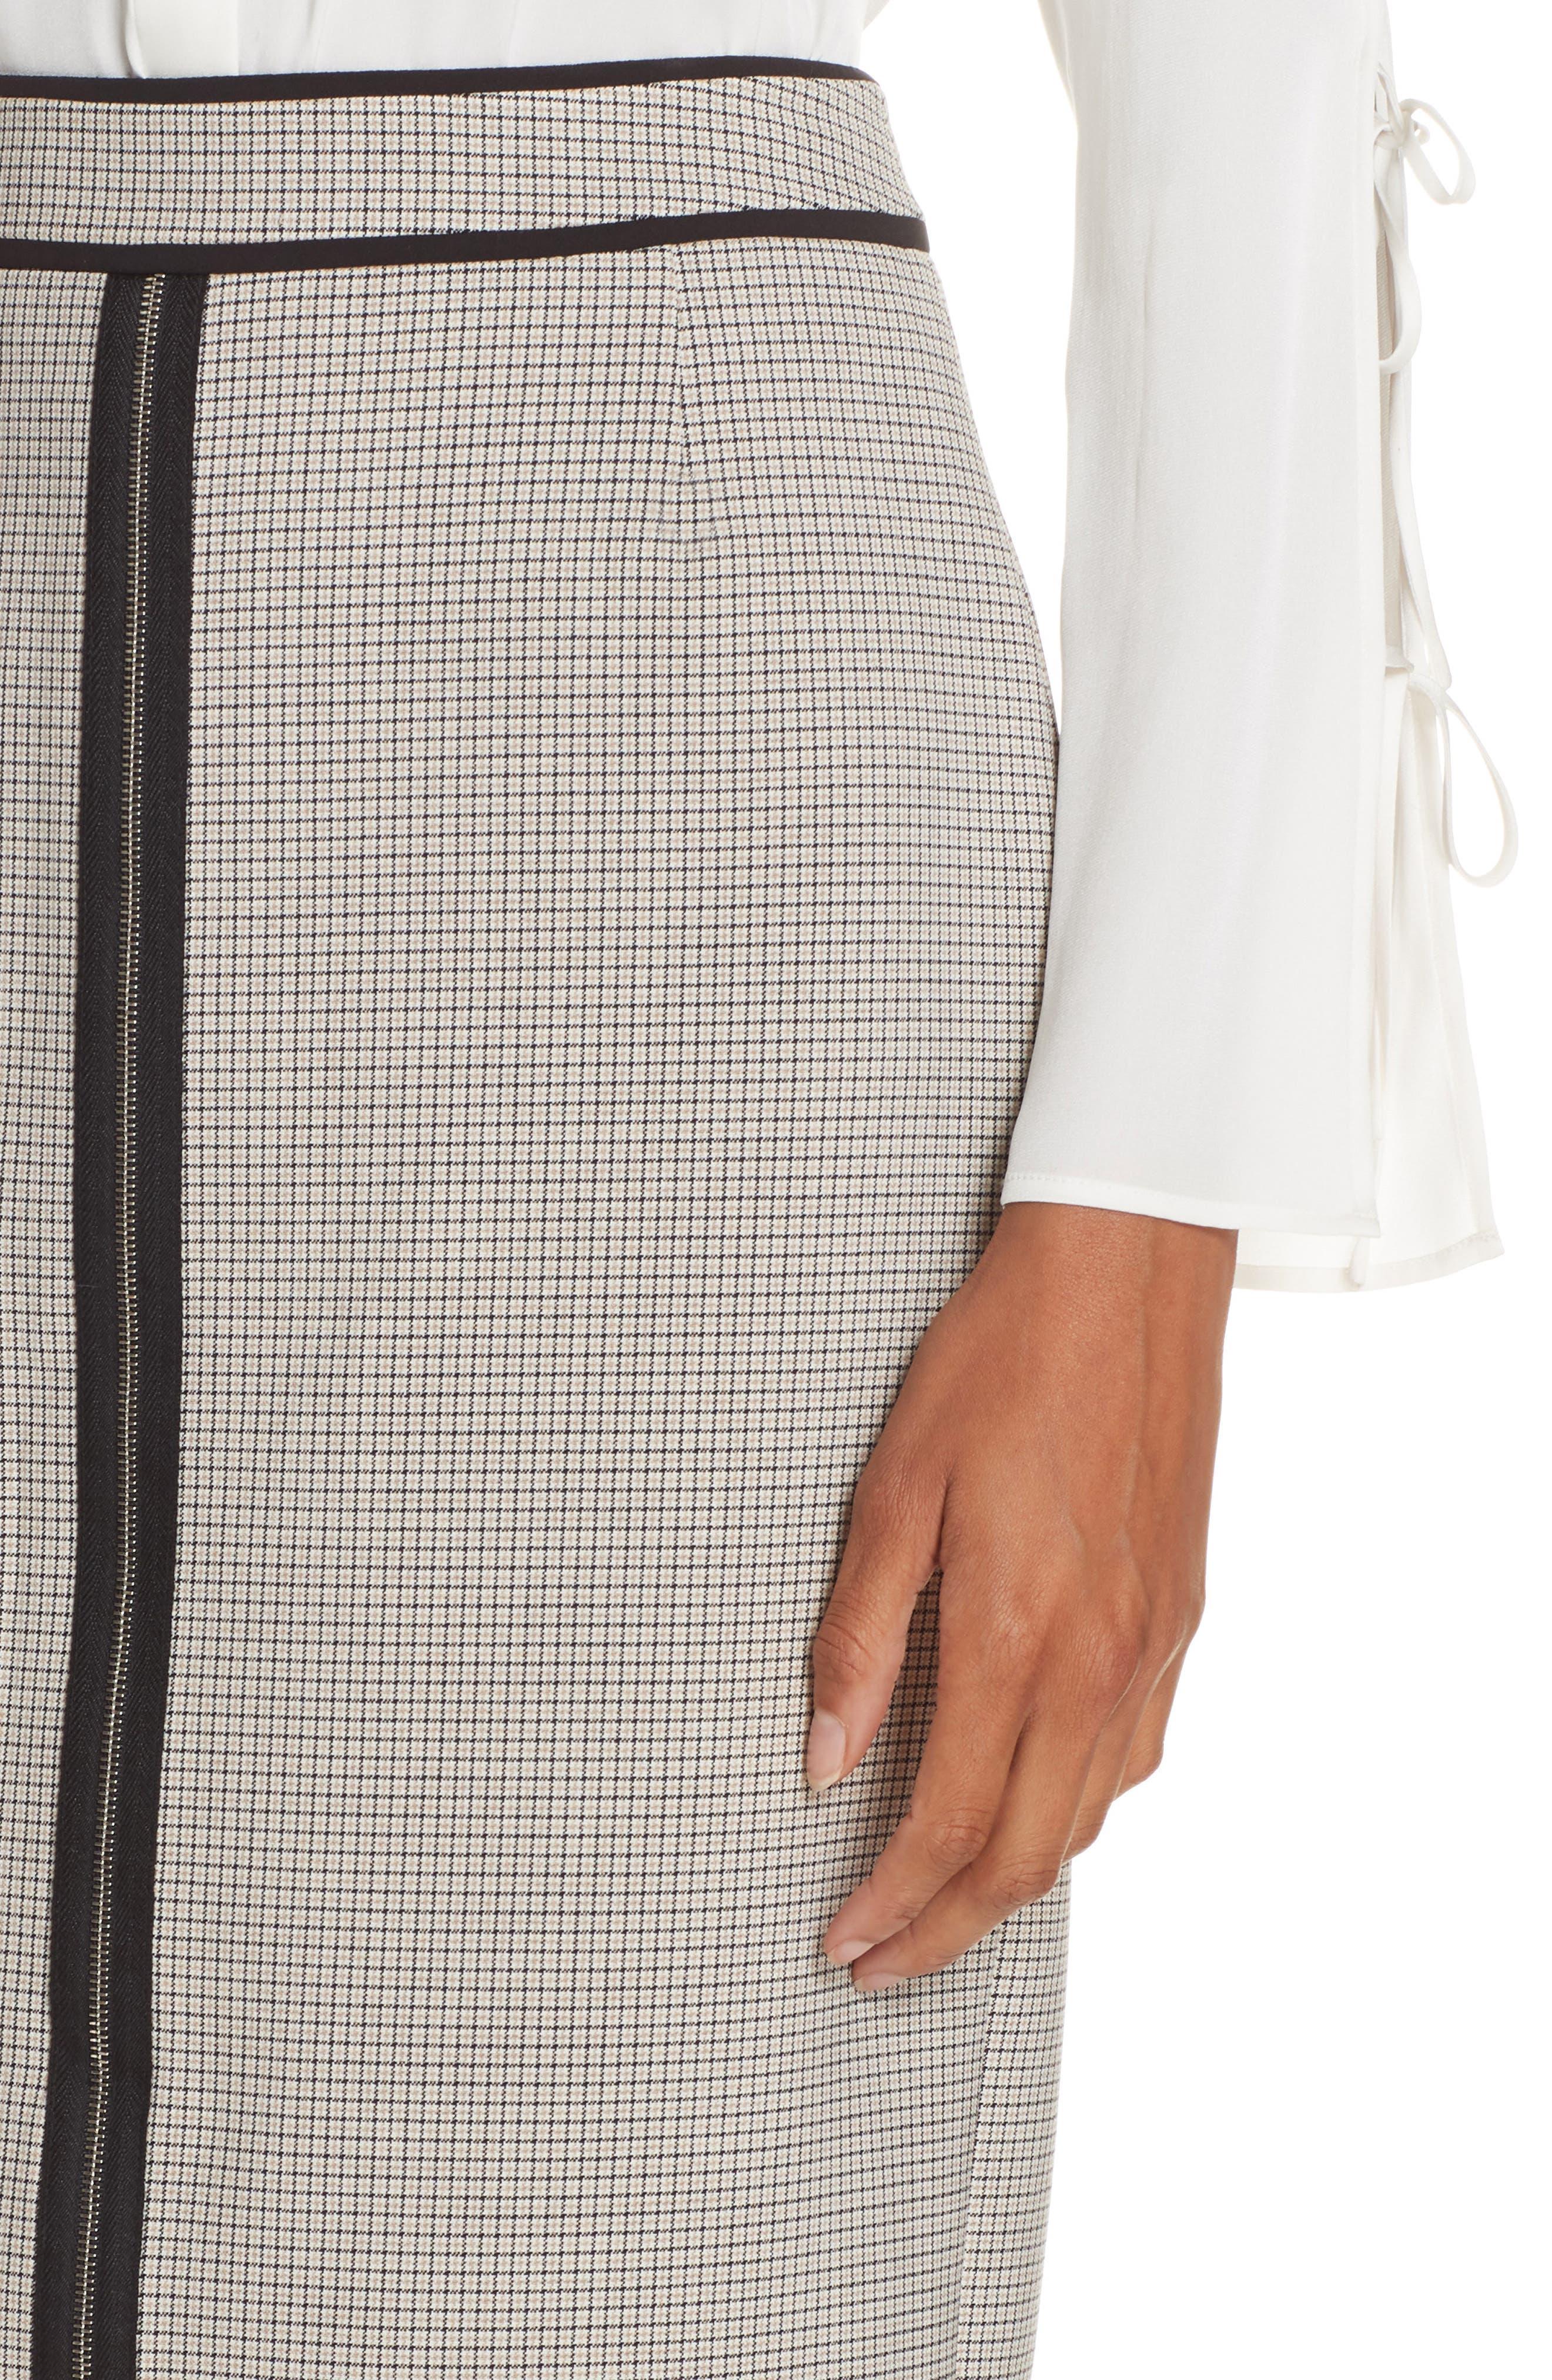 Voliviena Pencil Skirt,                             Alternate thumbnail 4, color,                             STONE FANTASTY